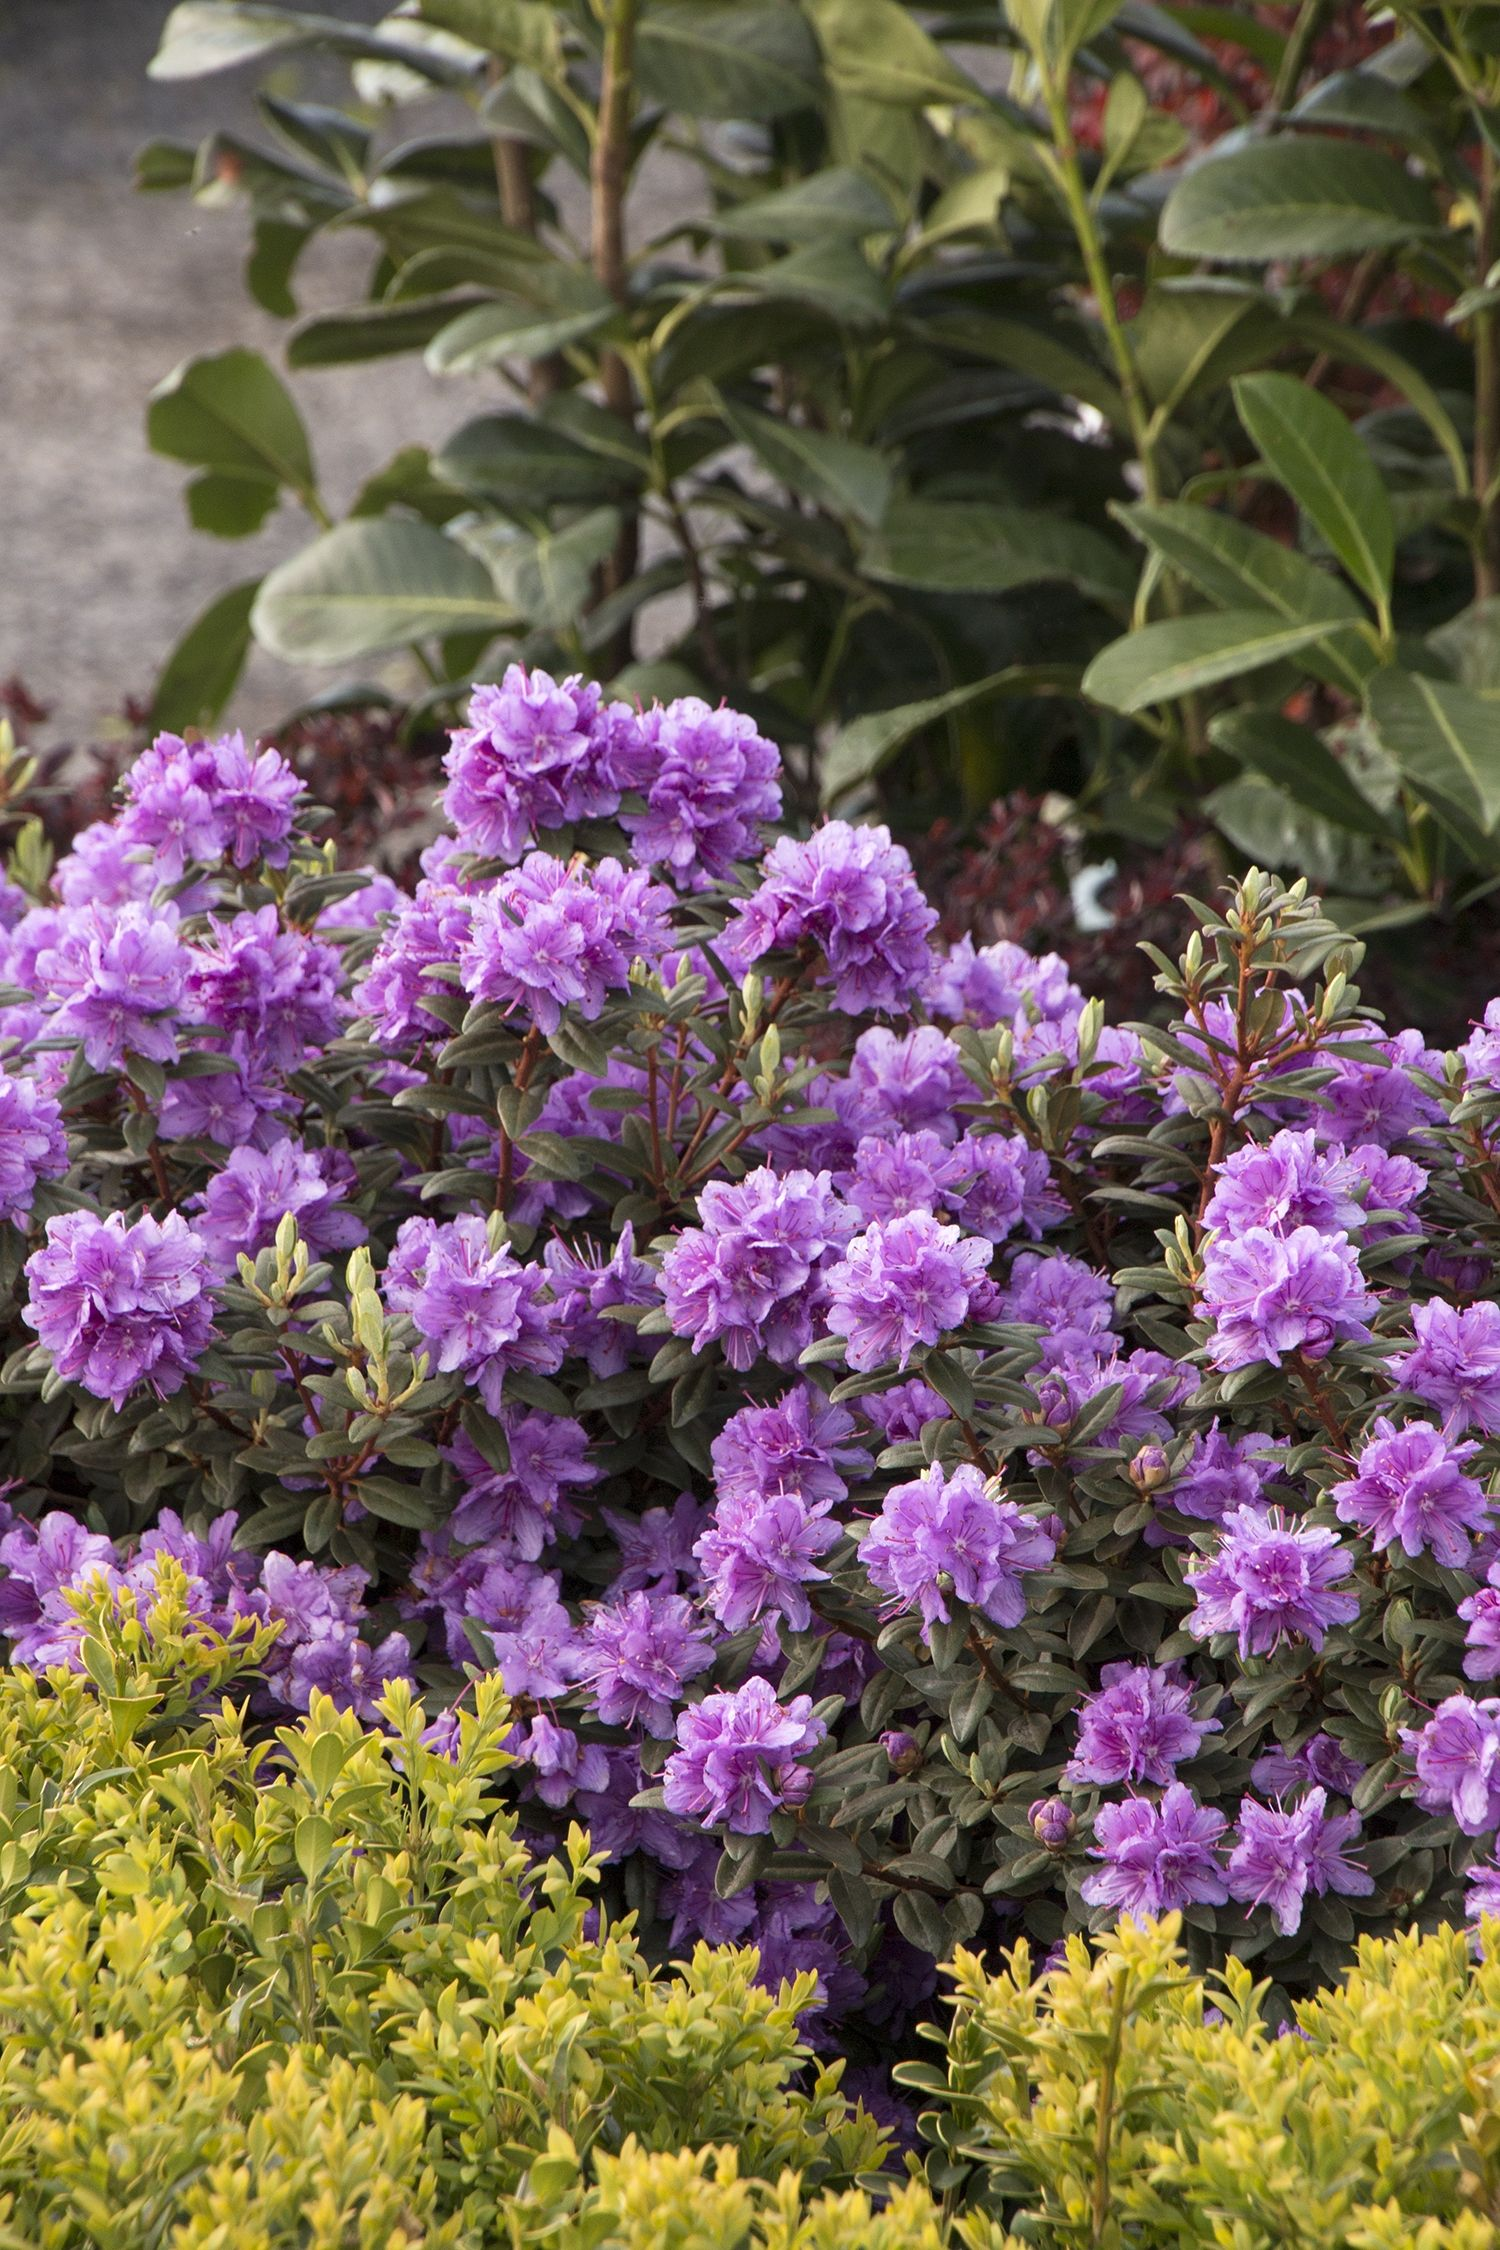 Ramapo Rhododendron Shrub Evergreen And Gardens